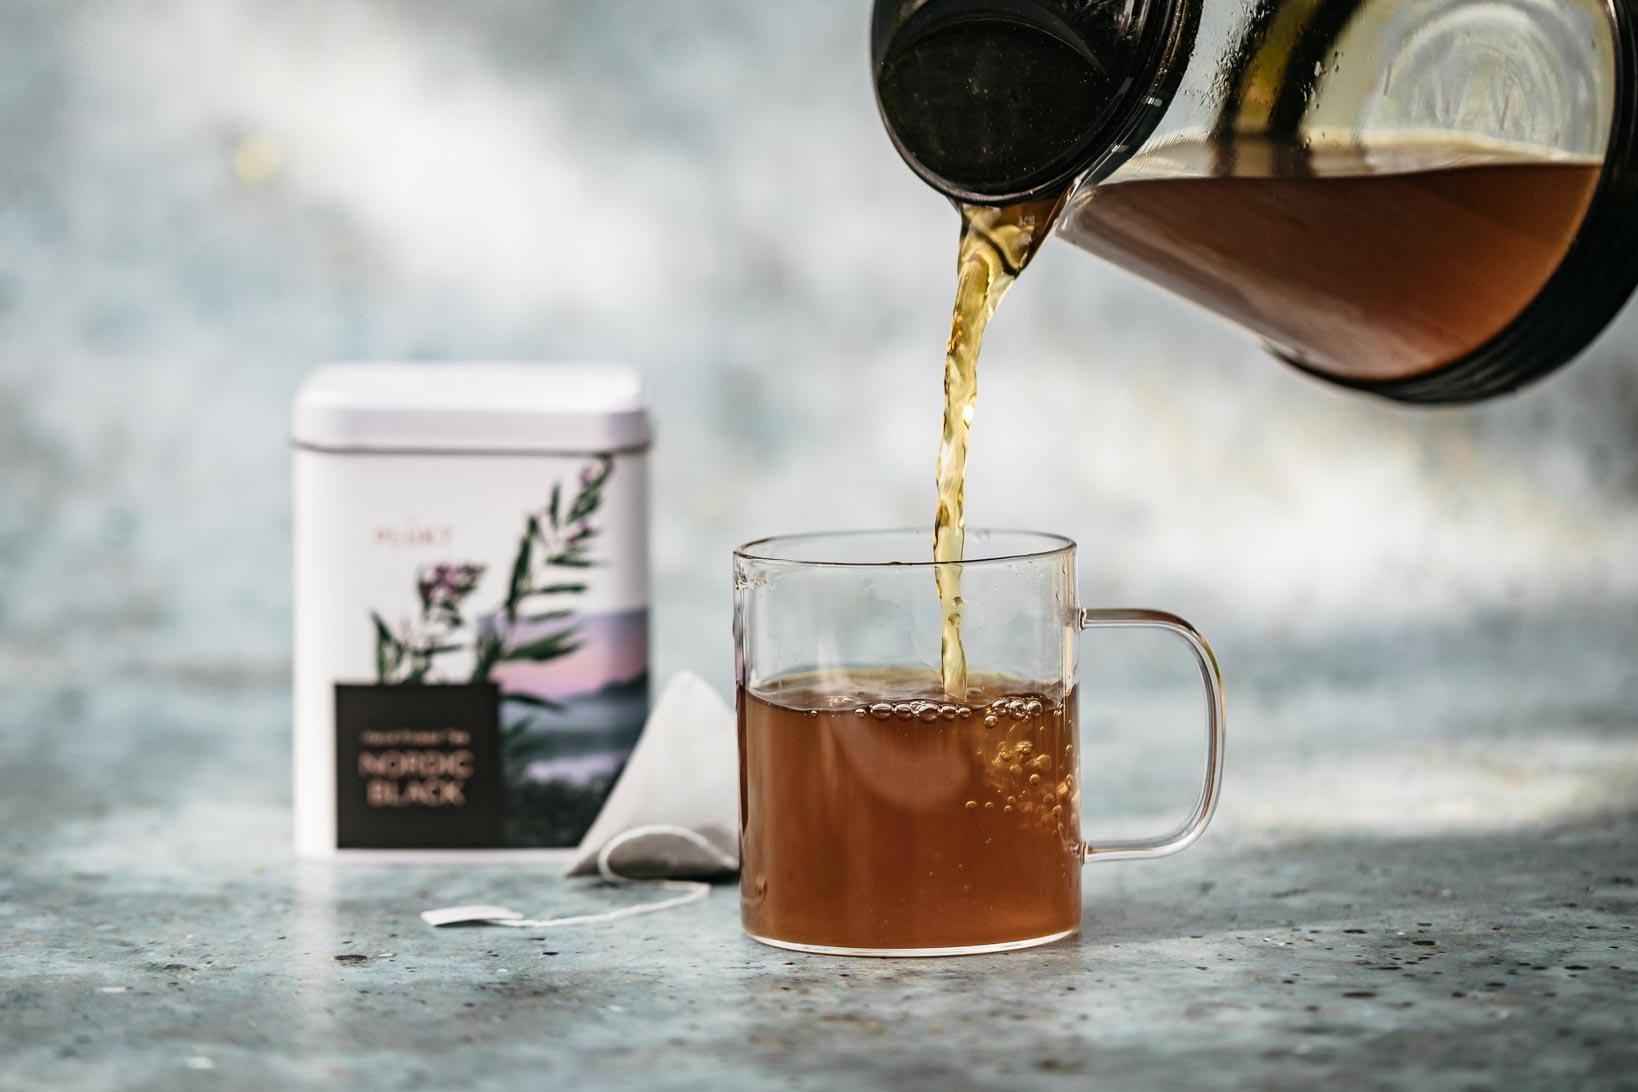 NORDIC BLACK TEA BREWED Plukt